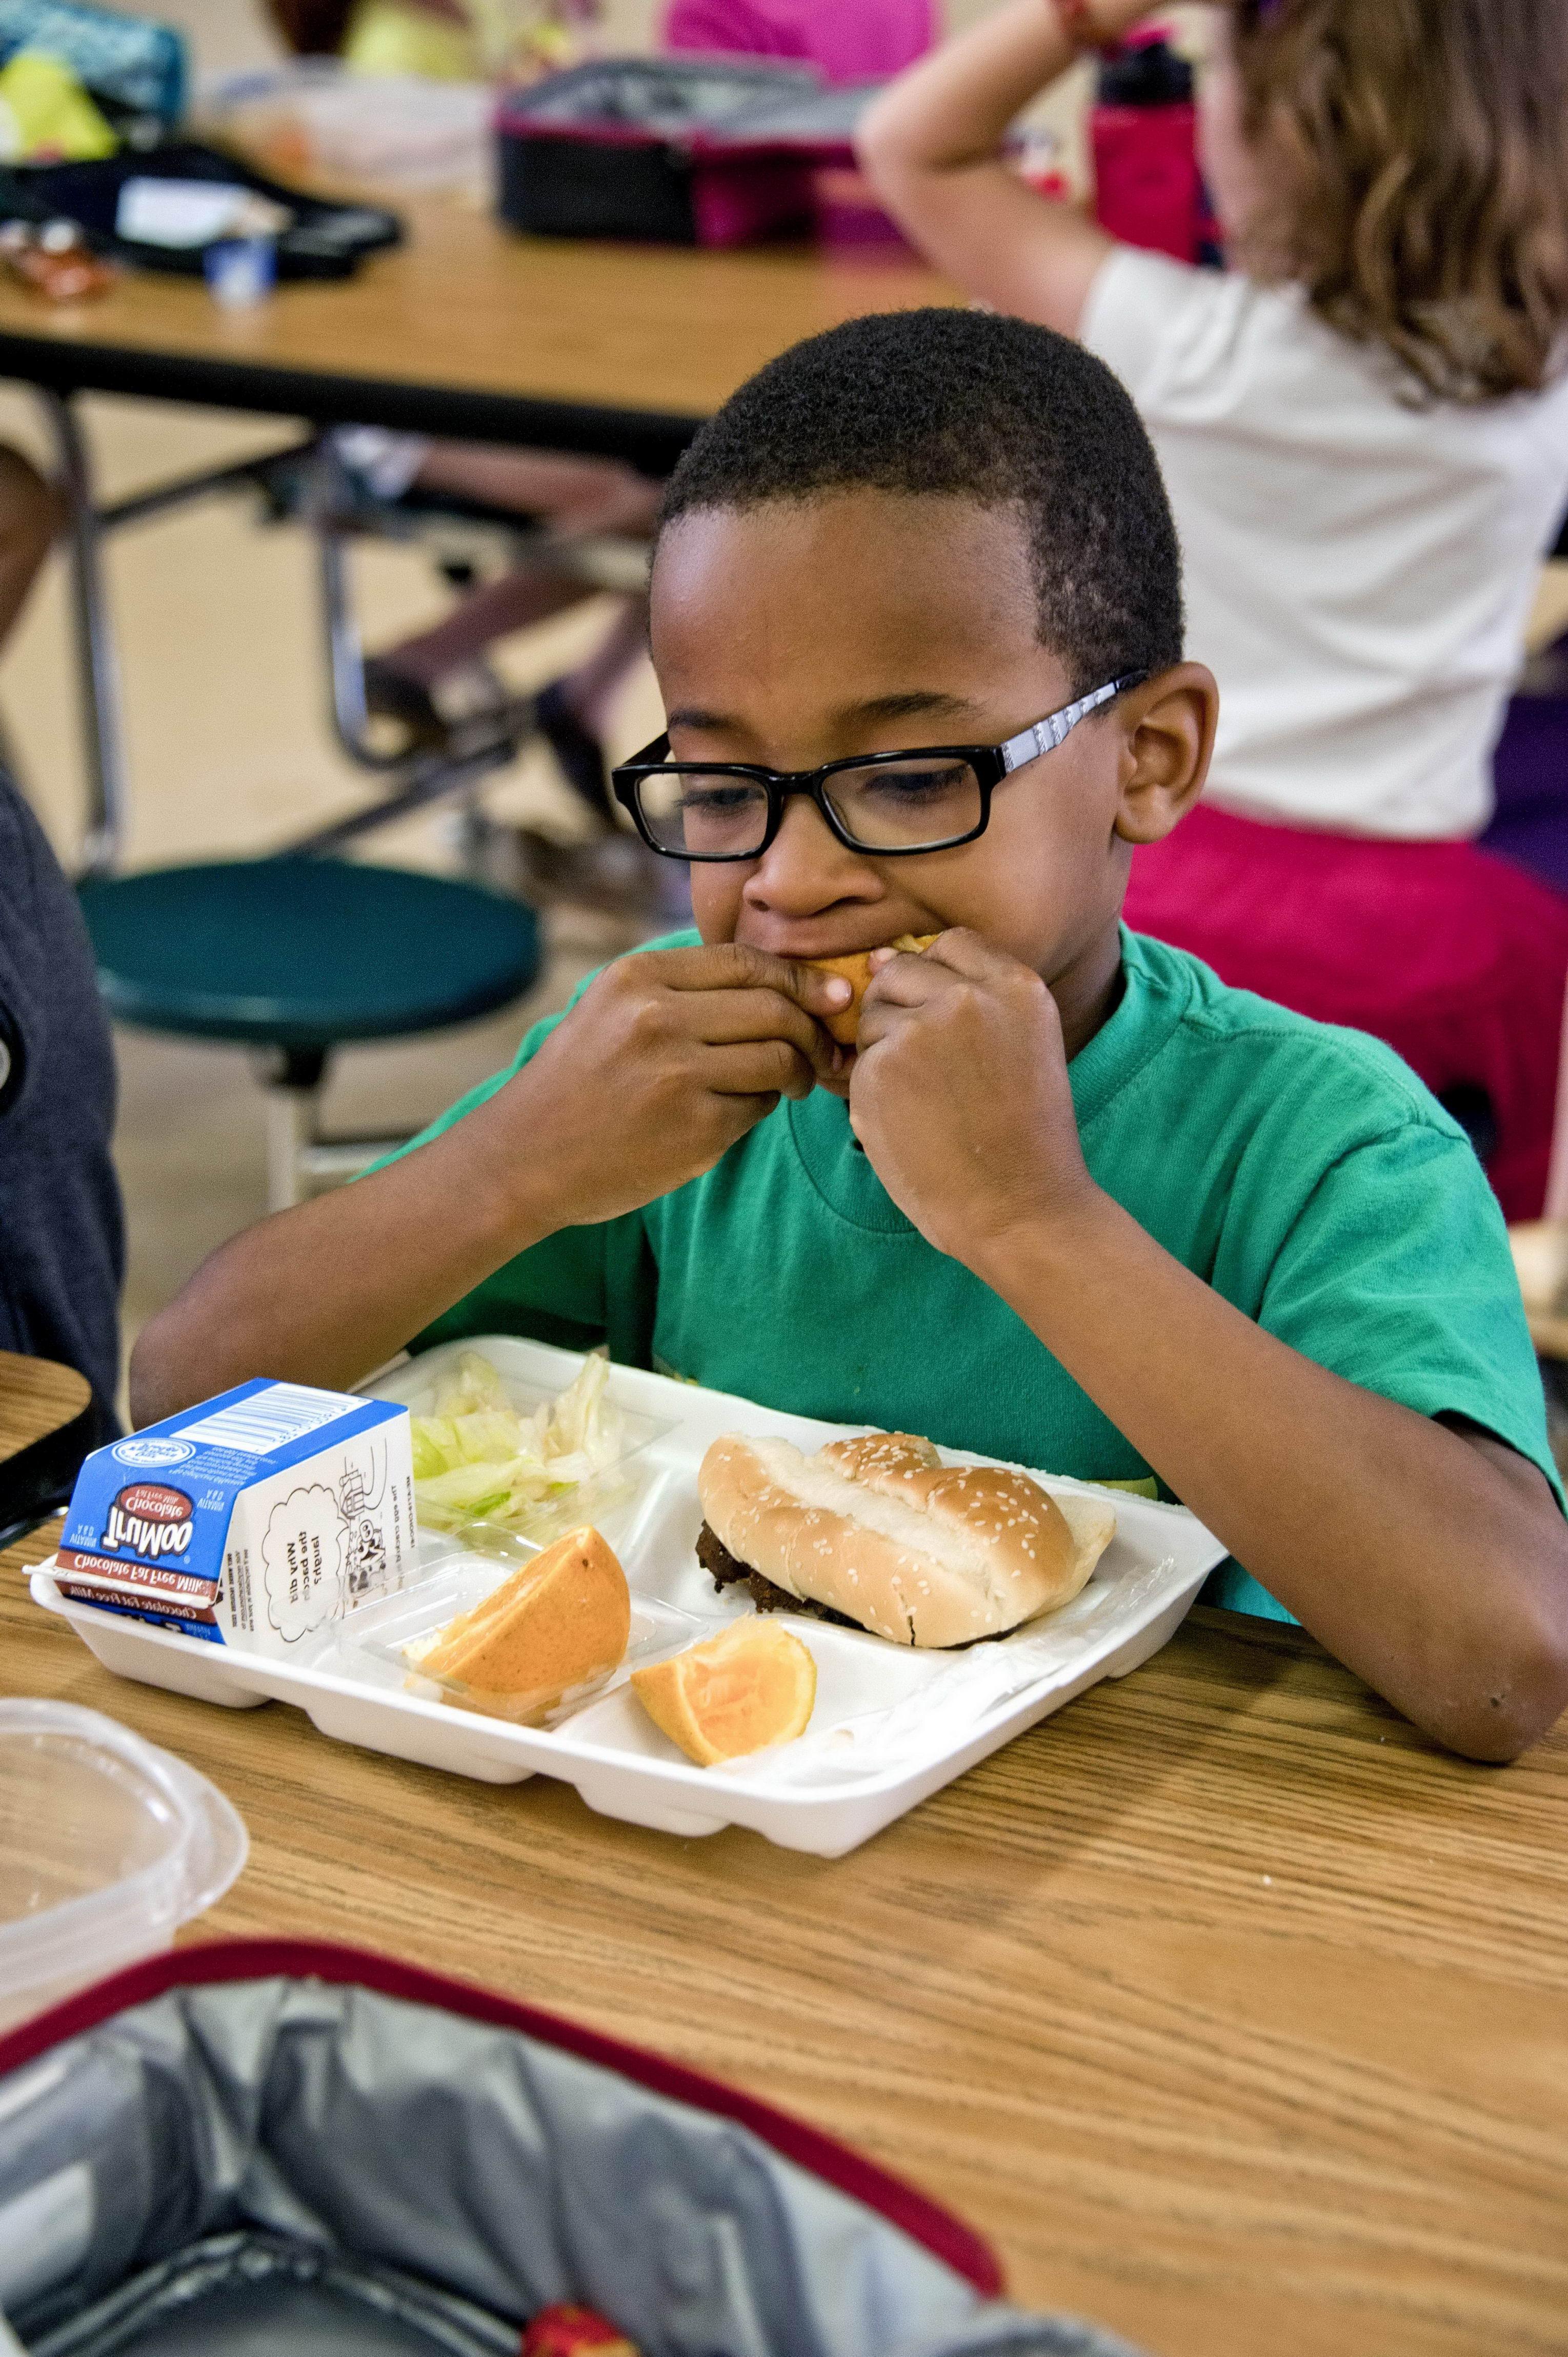 Free Picture Boy Eating Food Sandwich Fresh Salad Milk